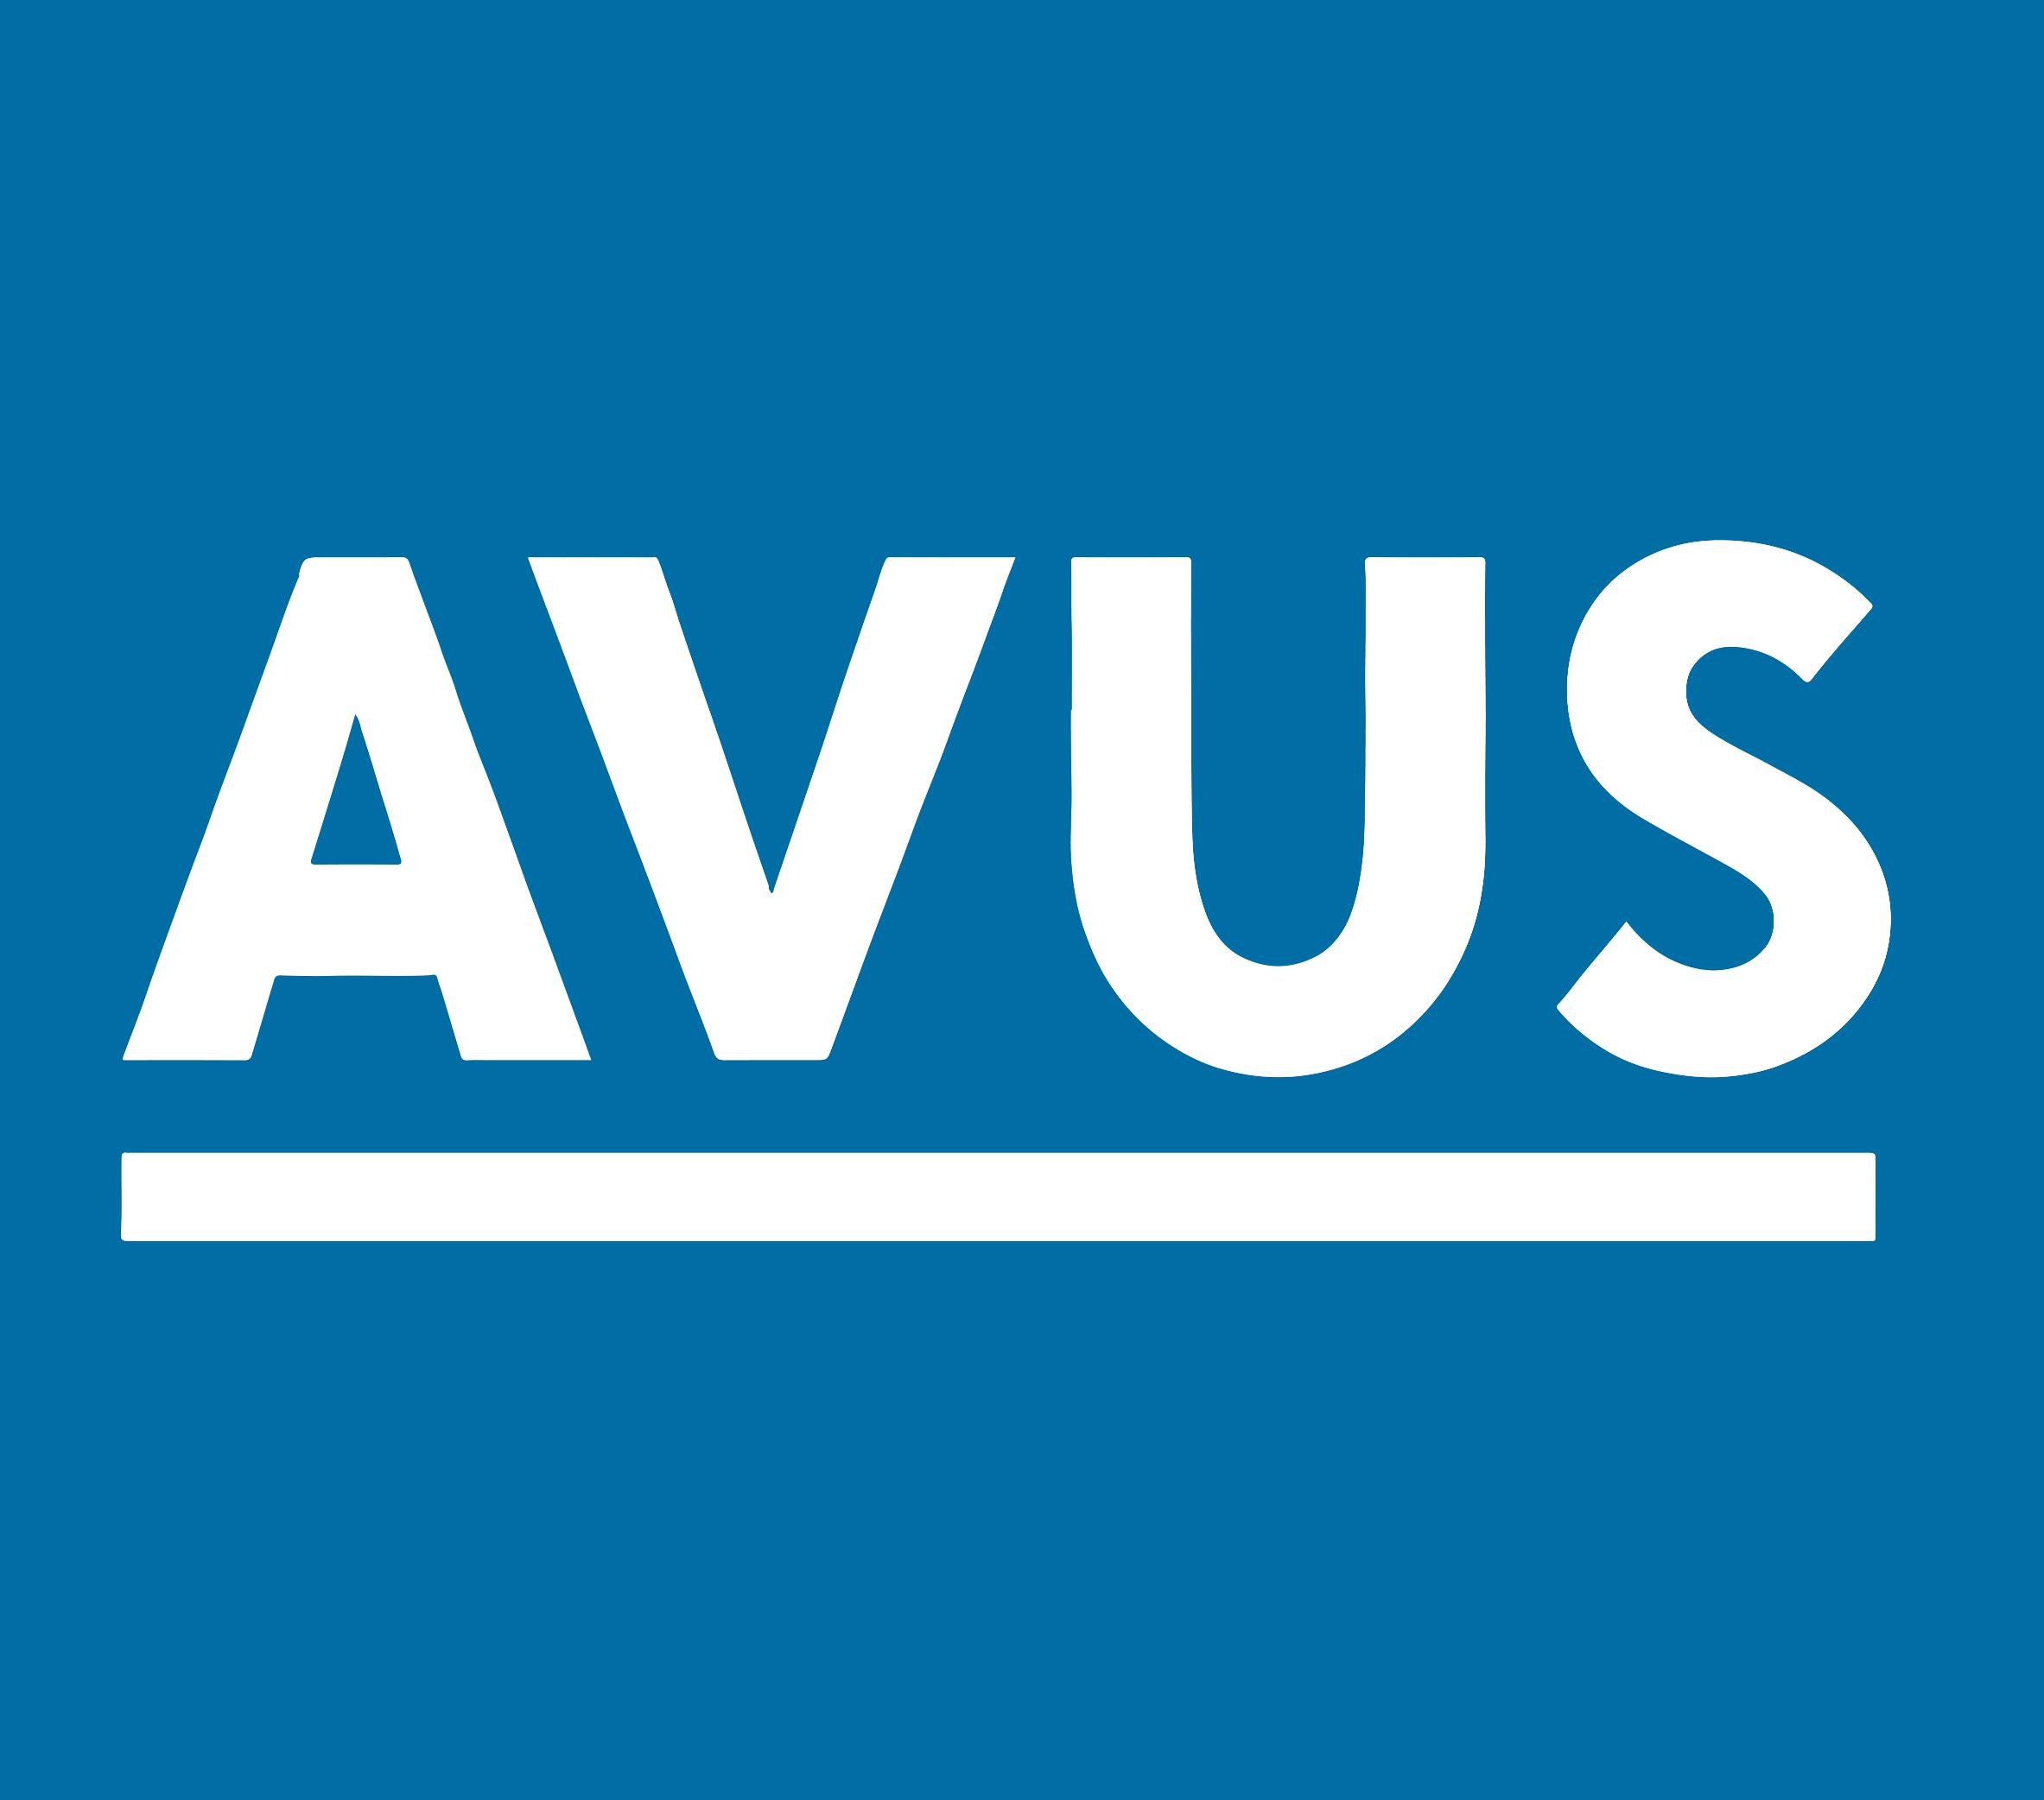 AVUS worldwide claim services